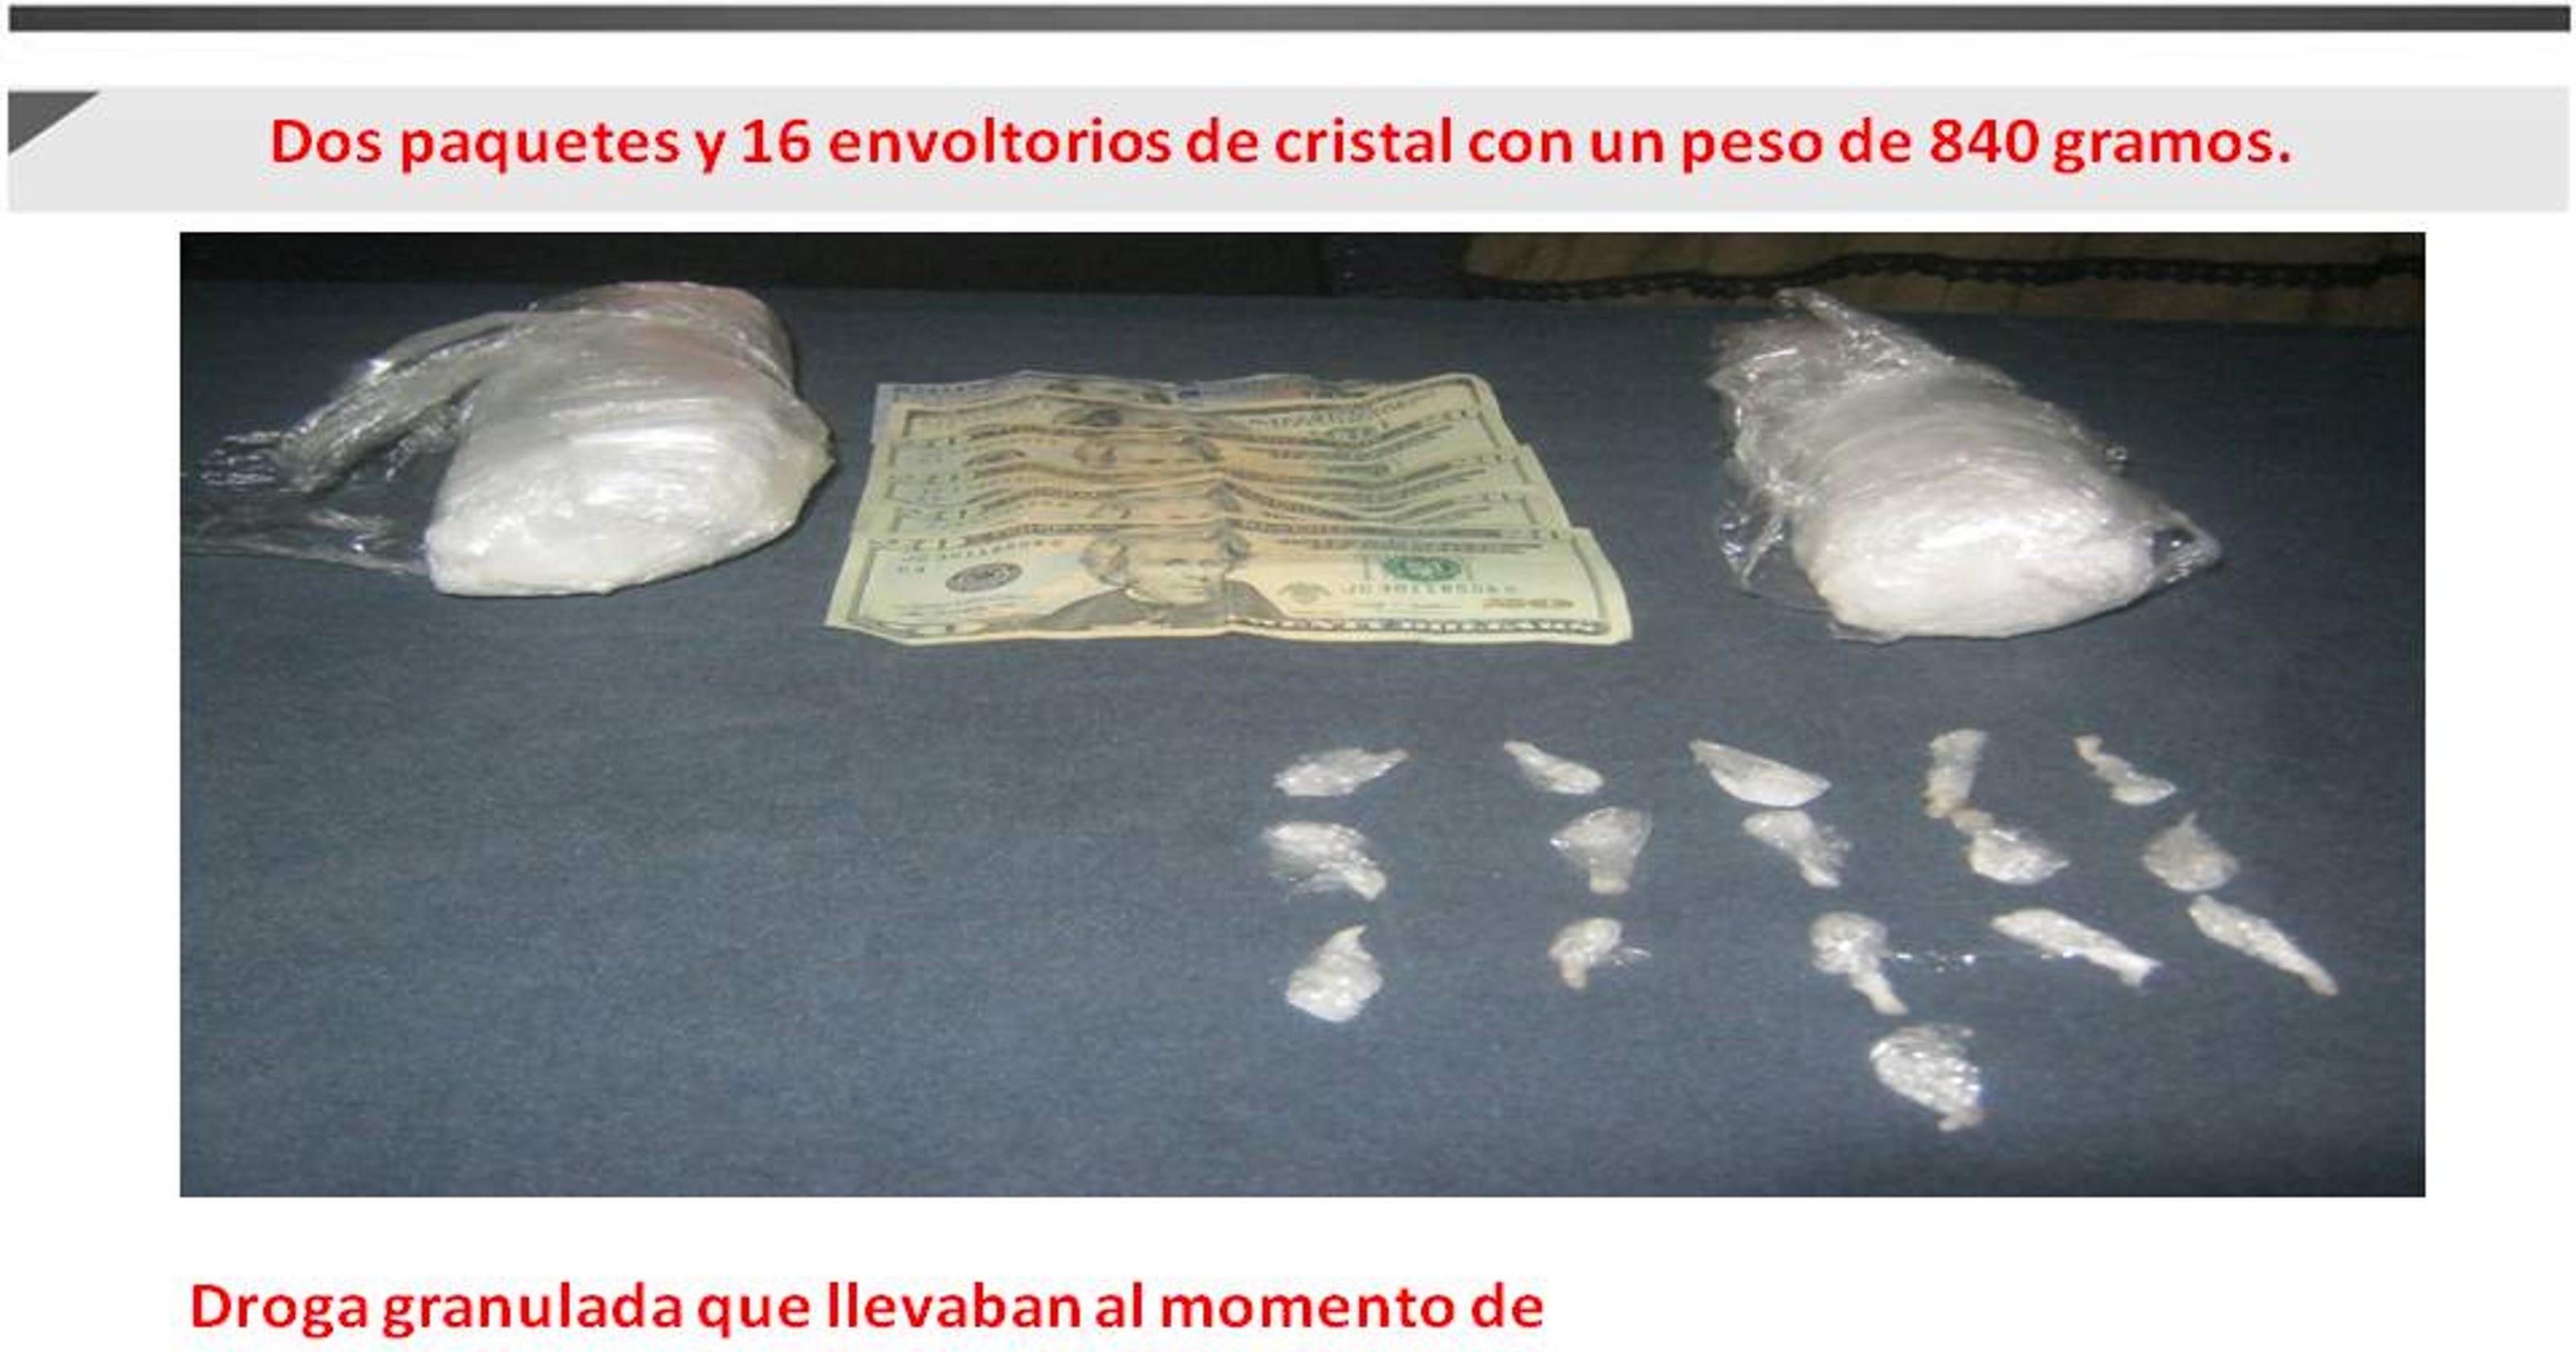 U.S. girls arrested in Juárez over crystal meth